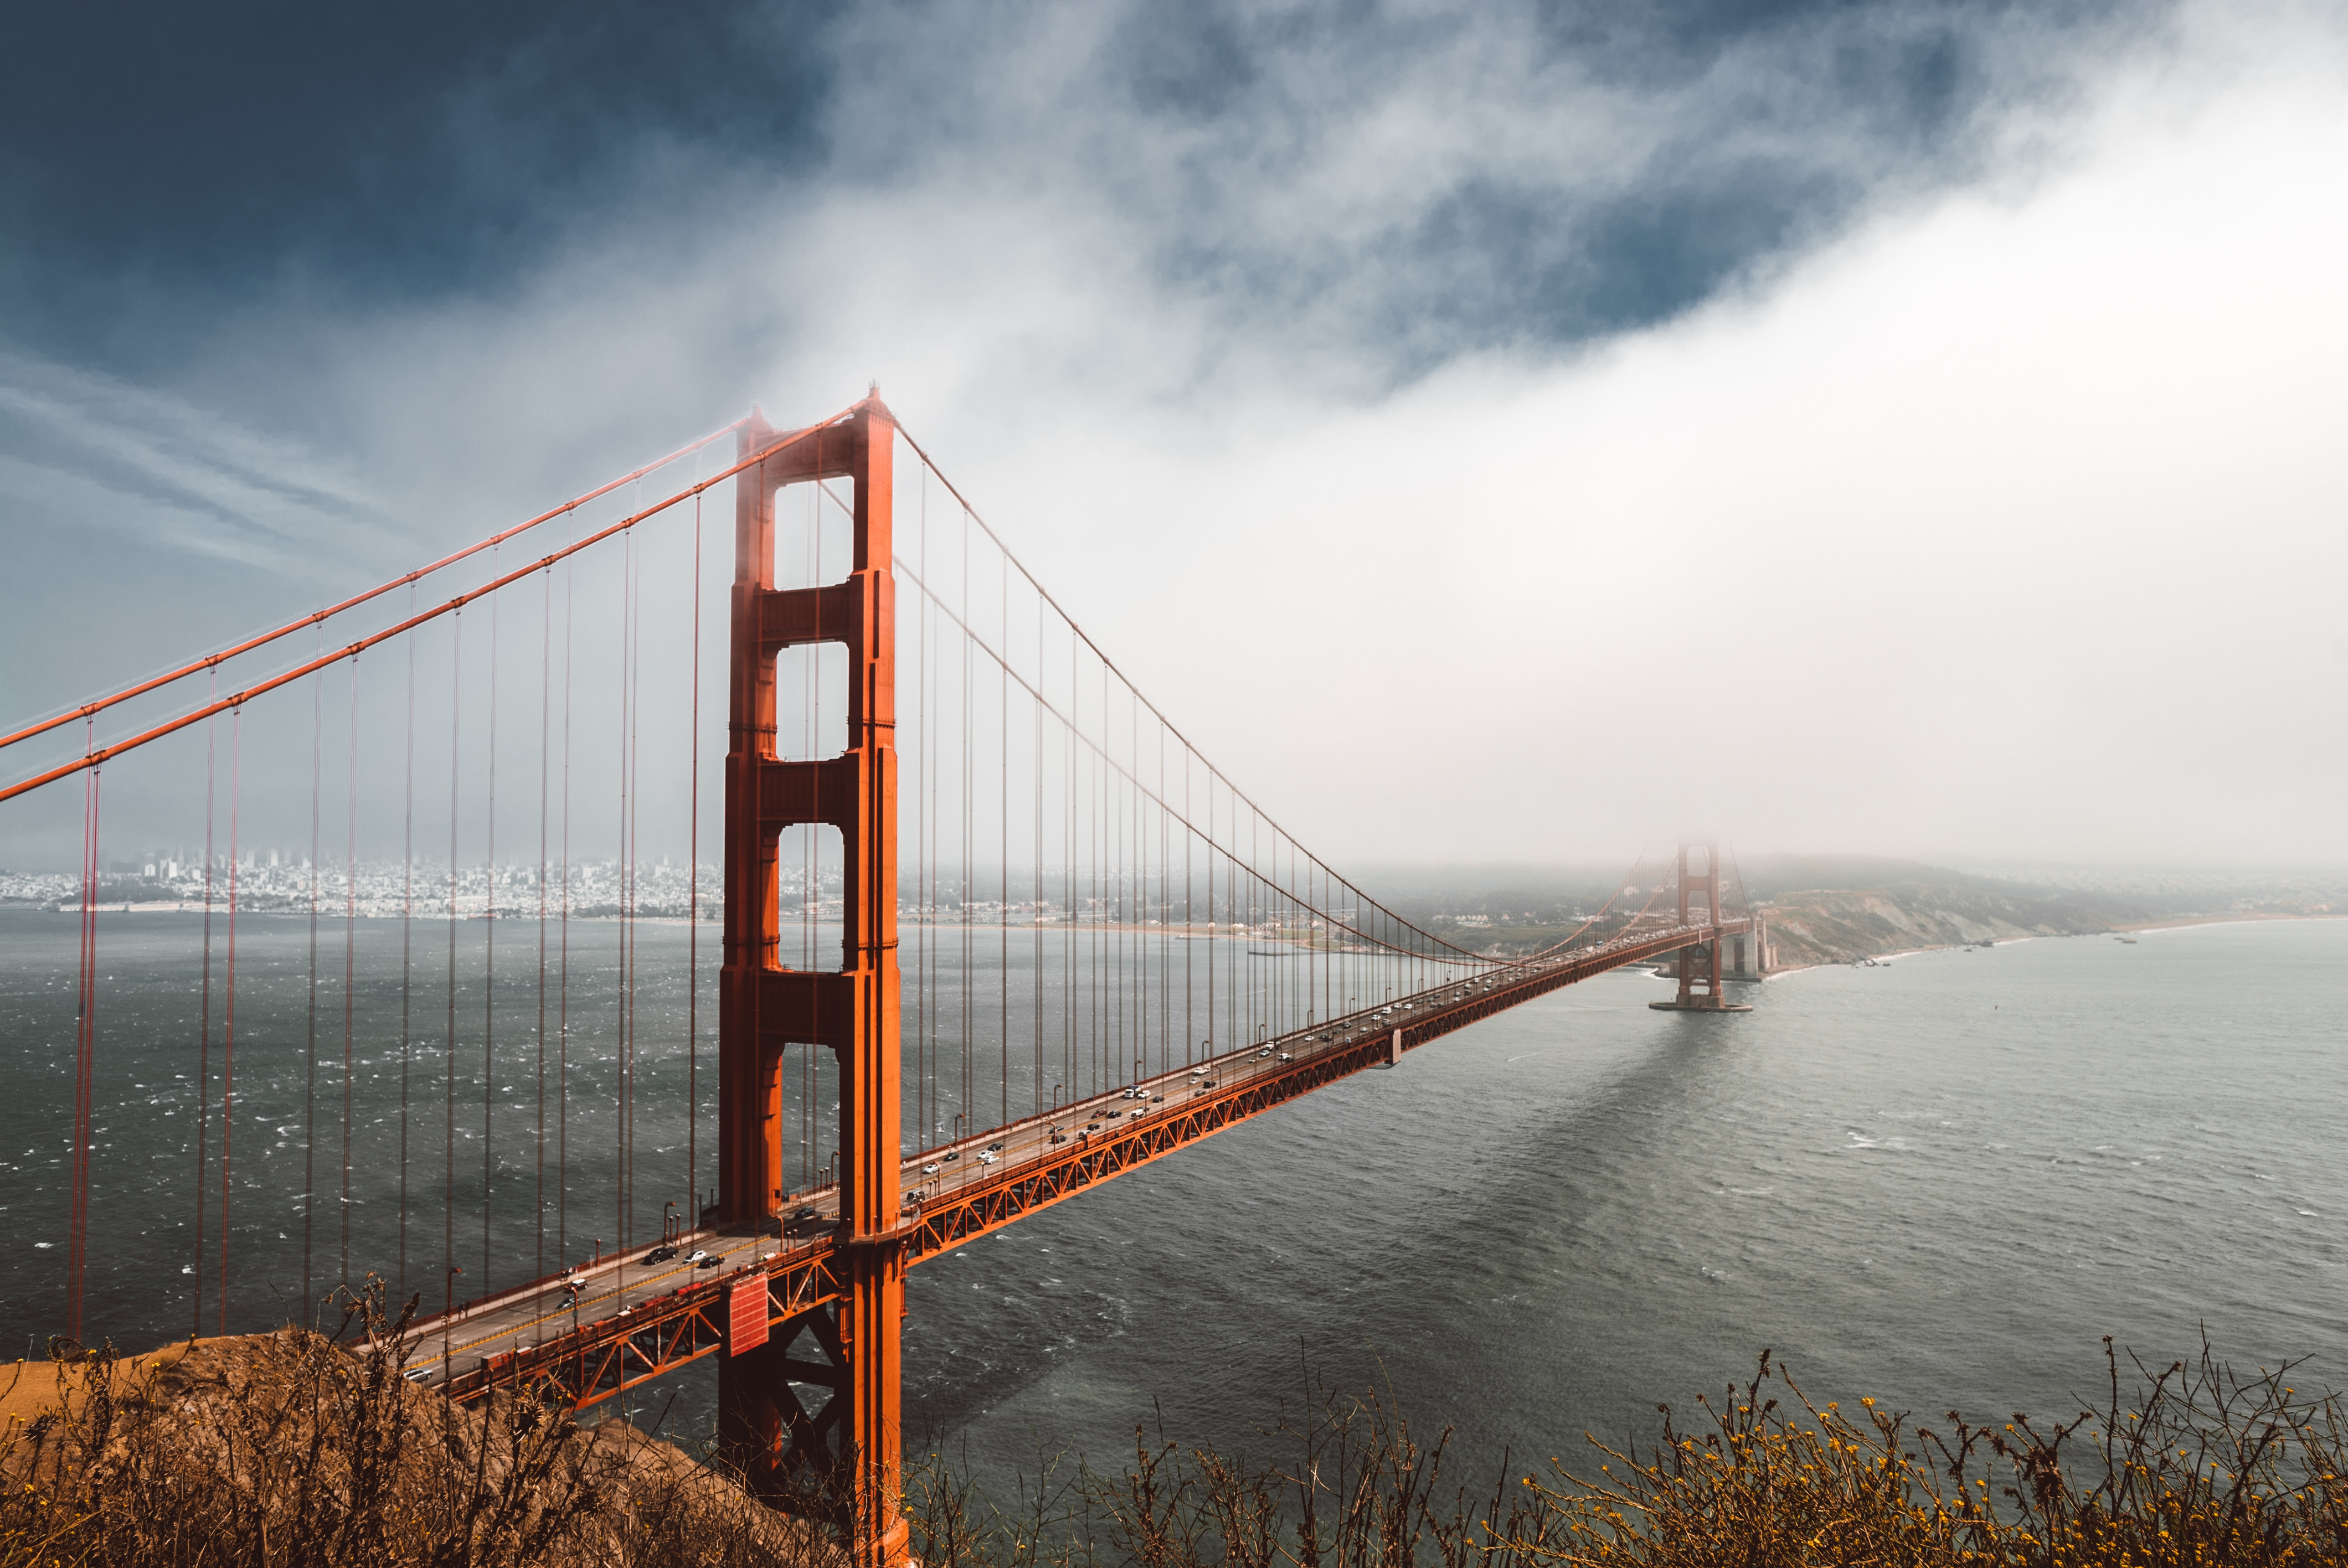 4k Golden Gate Bridge, HD World, 4k